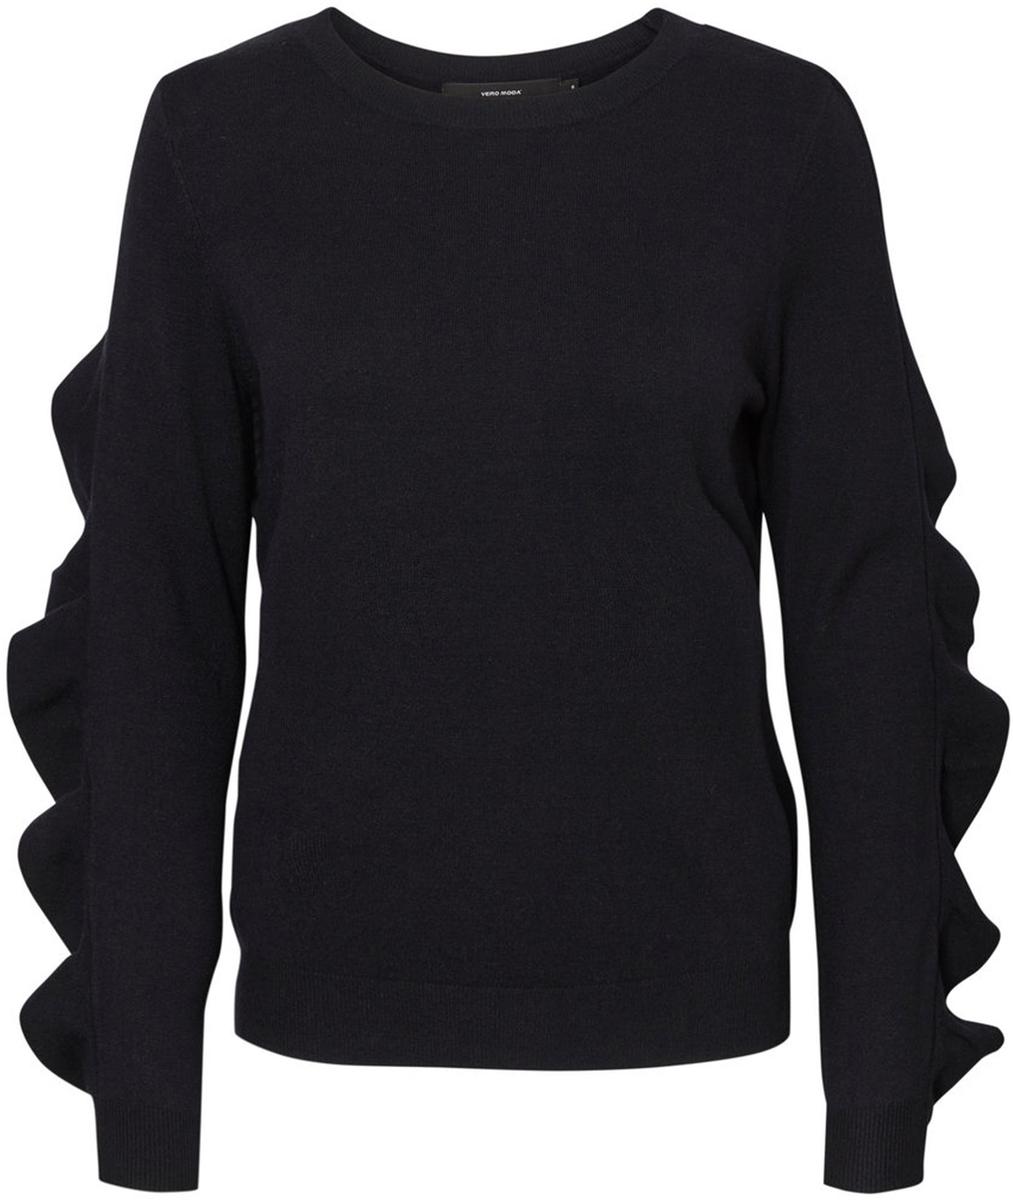 Пуловер жен Vero Moda, цвет: черный. 10185482_Black. Размер M (46)10185482_Black